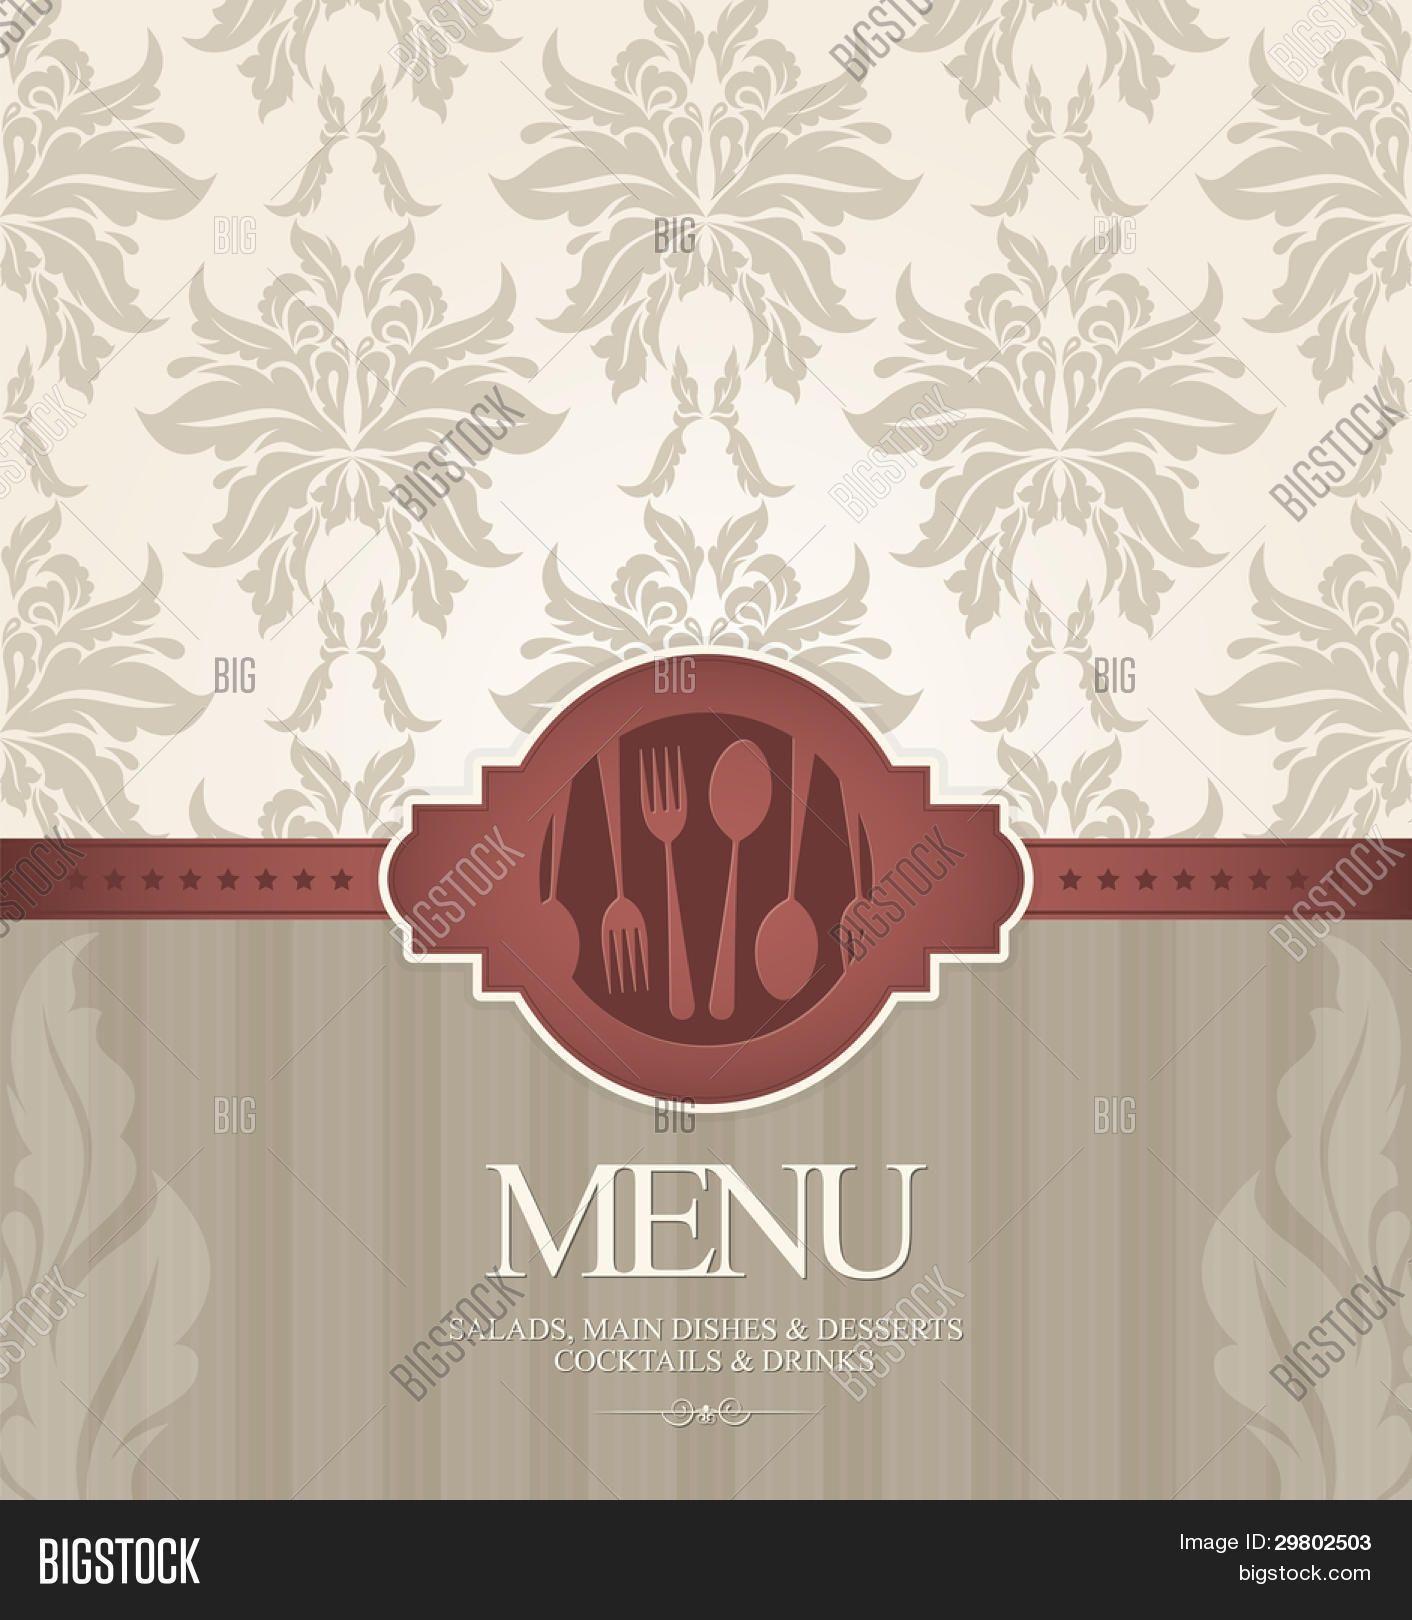 Restaurant Menu Background Design 996435 Hd Wallpaper Backgrounds Download